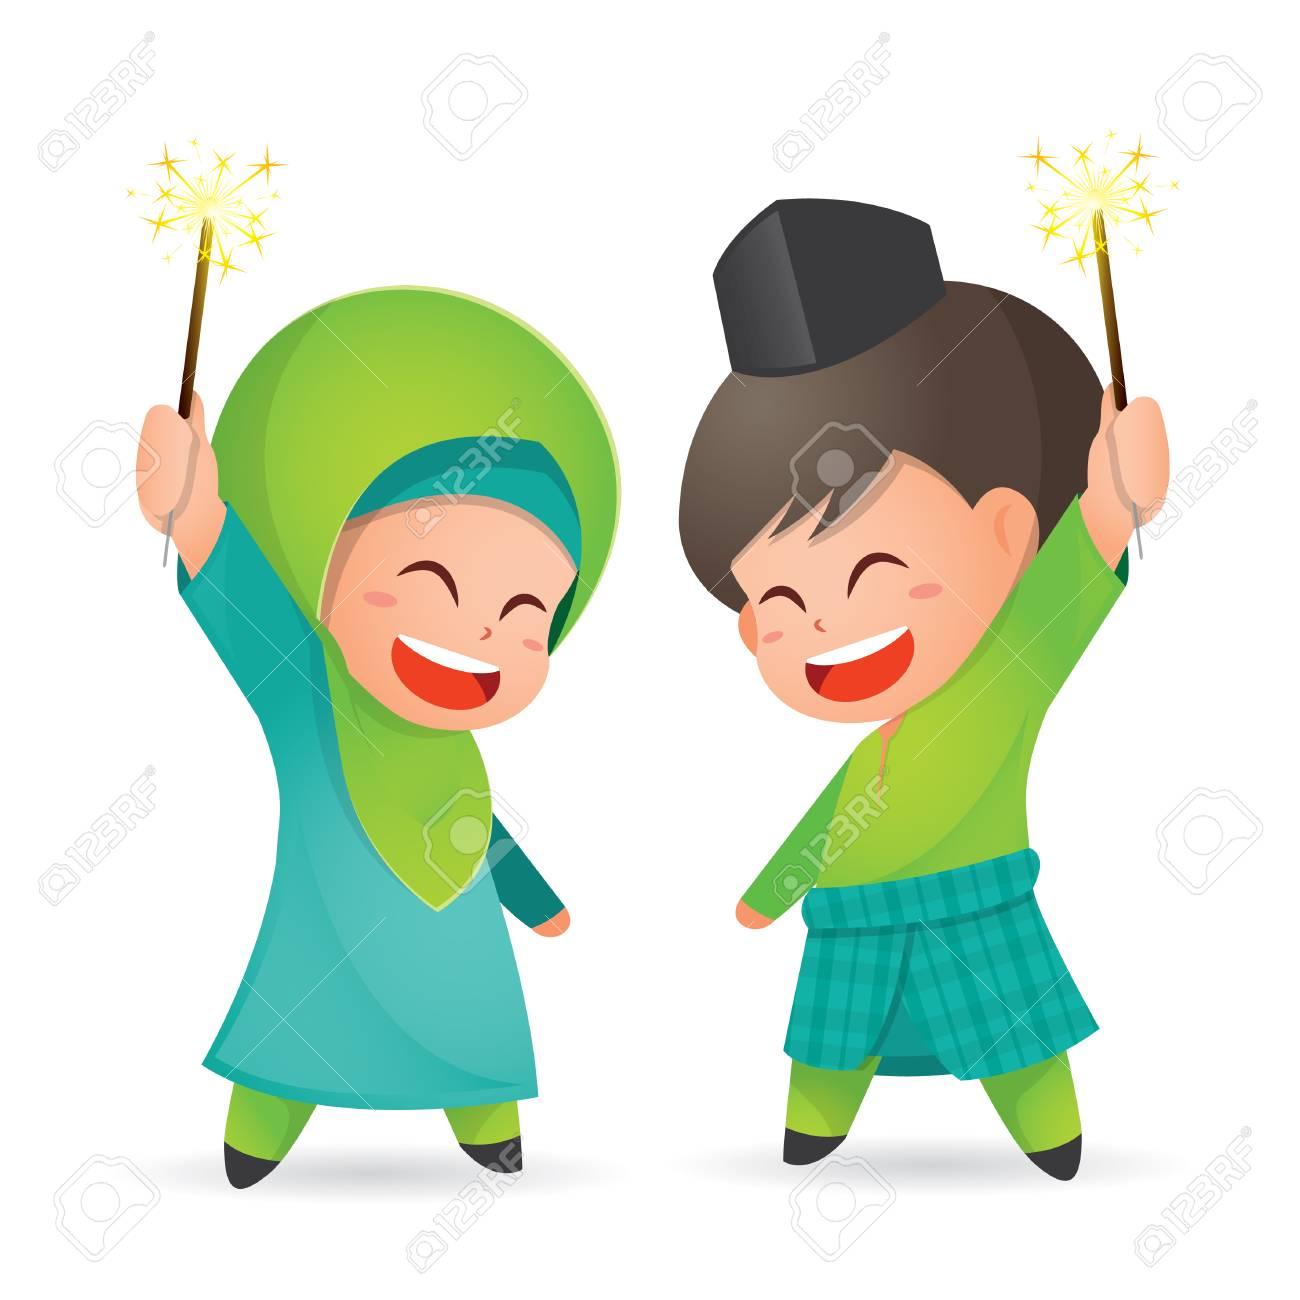 Selamat Hari Raya Aidilfitri vector illustration. Cute muslim kids having fun with sparklers - 102618267